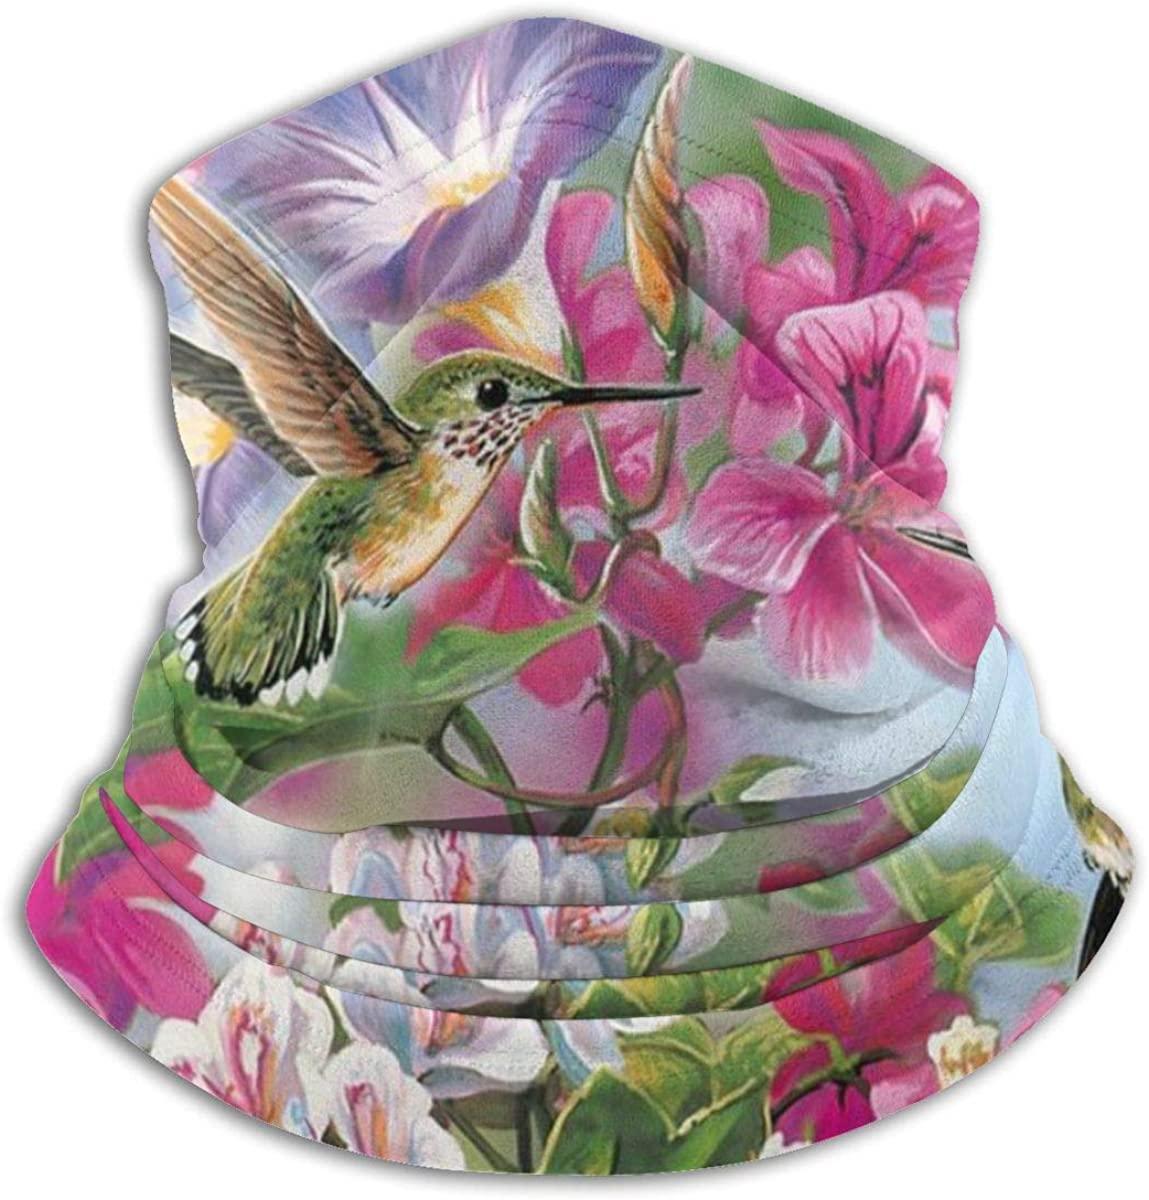 Hummingbird Flowers Seamless Face Mask Neck Gaiter Bandanas Multi-Functiona for Dust, Outdoors, Festivals, Sports Black